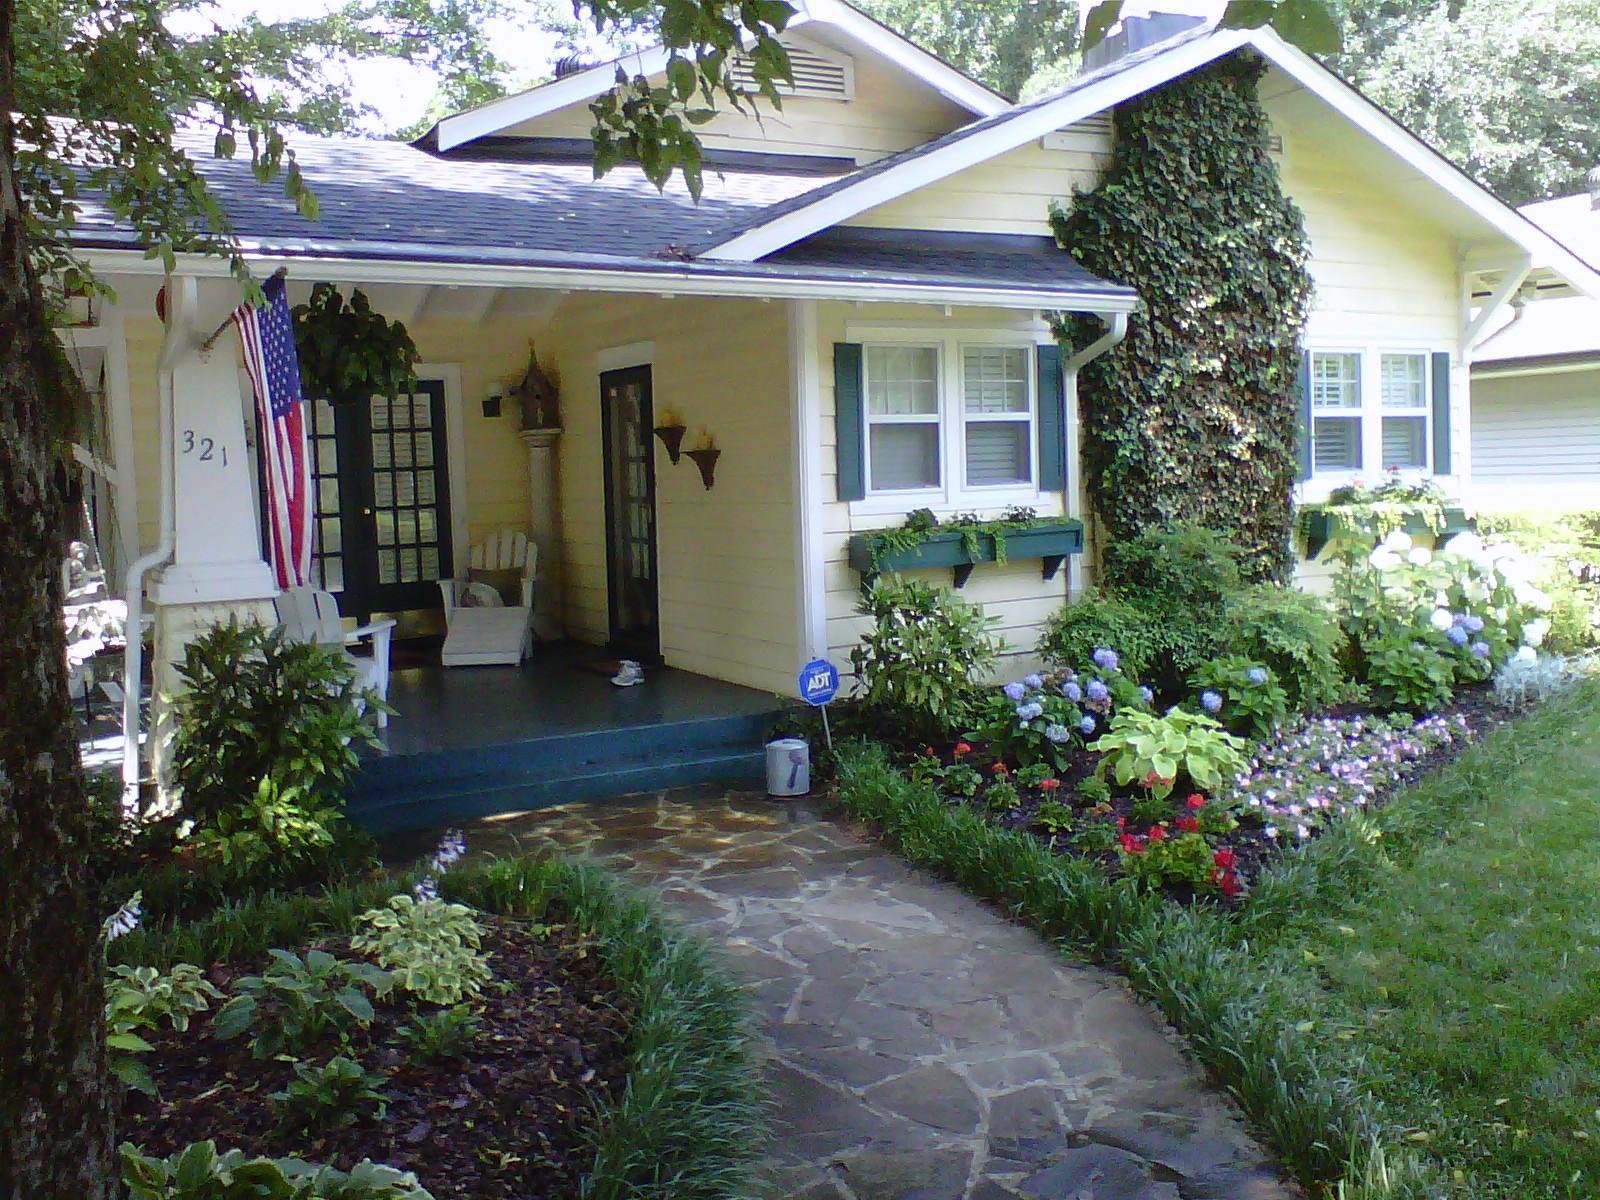 Justin Stelter Landscape Gardening - Cottage Garden - 12465150865_9de3f8f52b_o.jpg